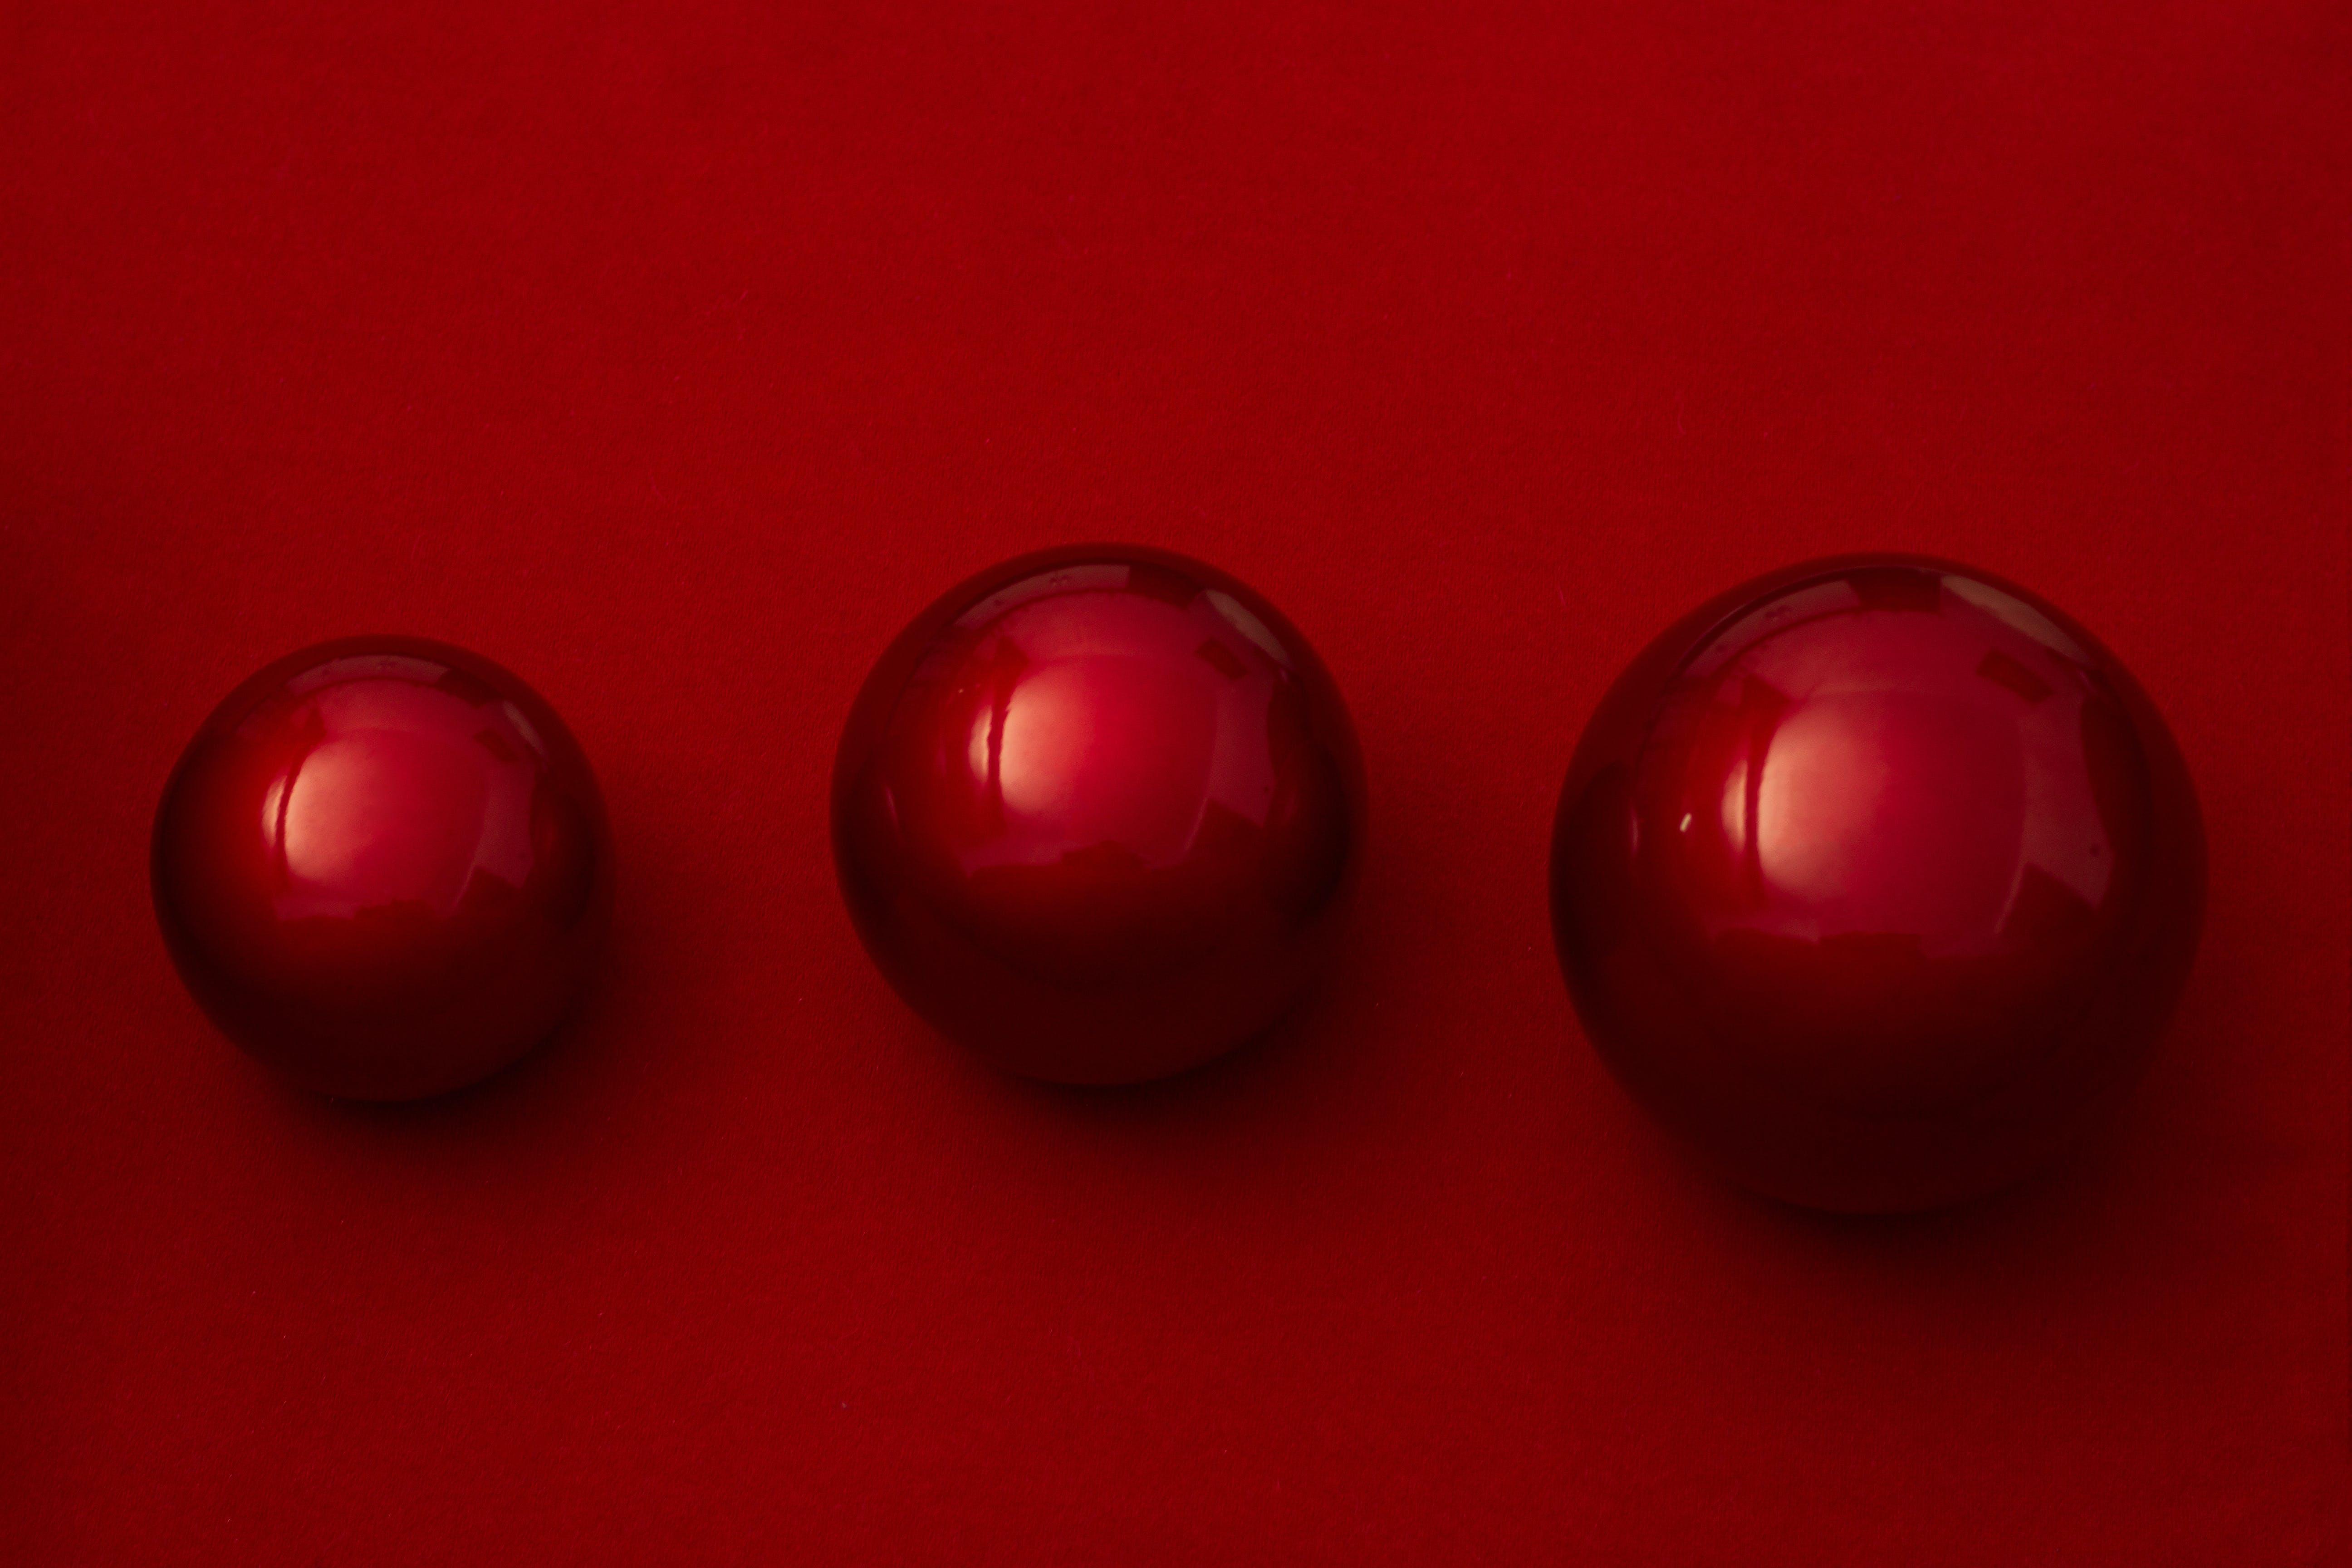 Free stock photo of abstract art, abstrato, balls, bolas